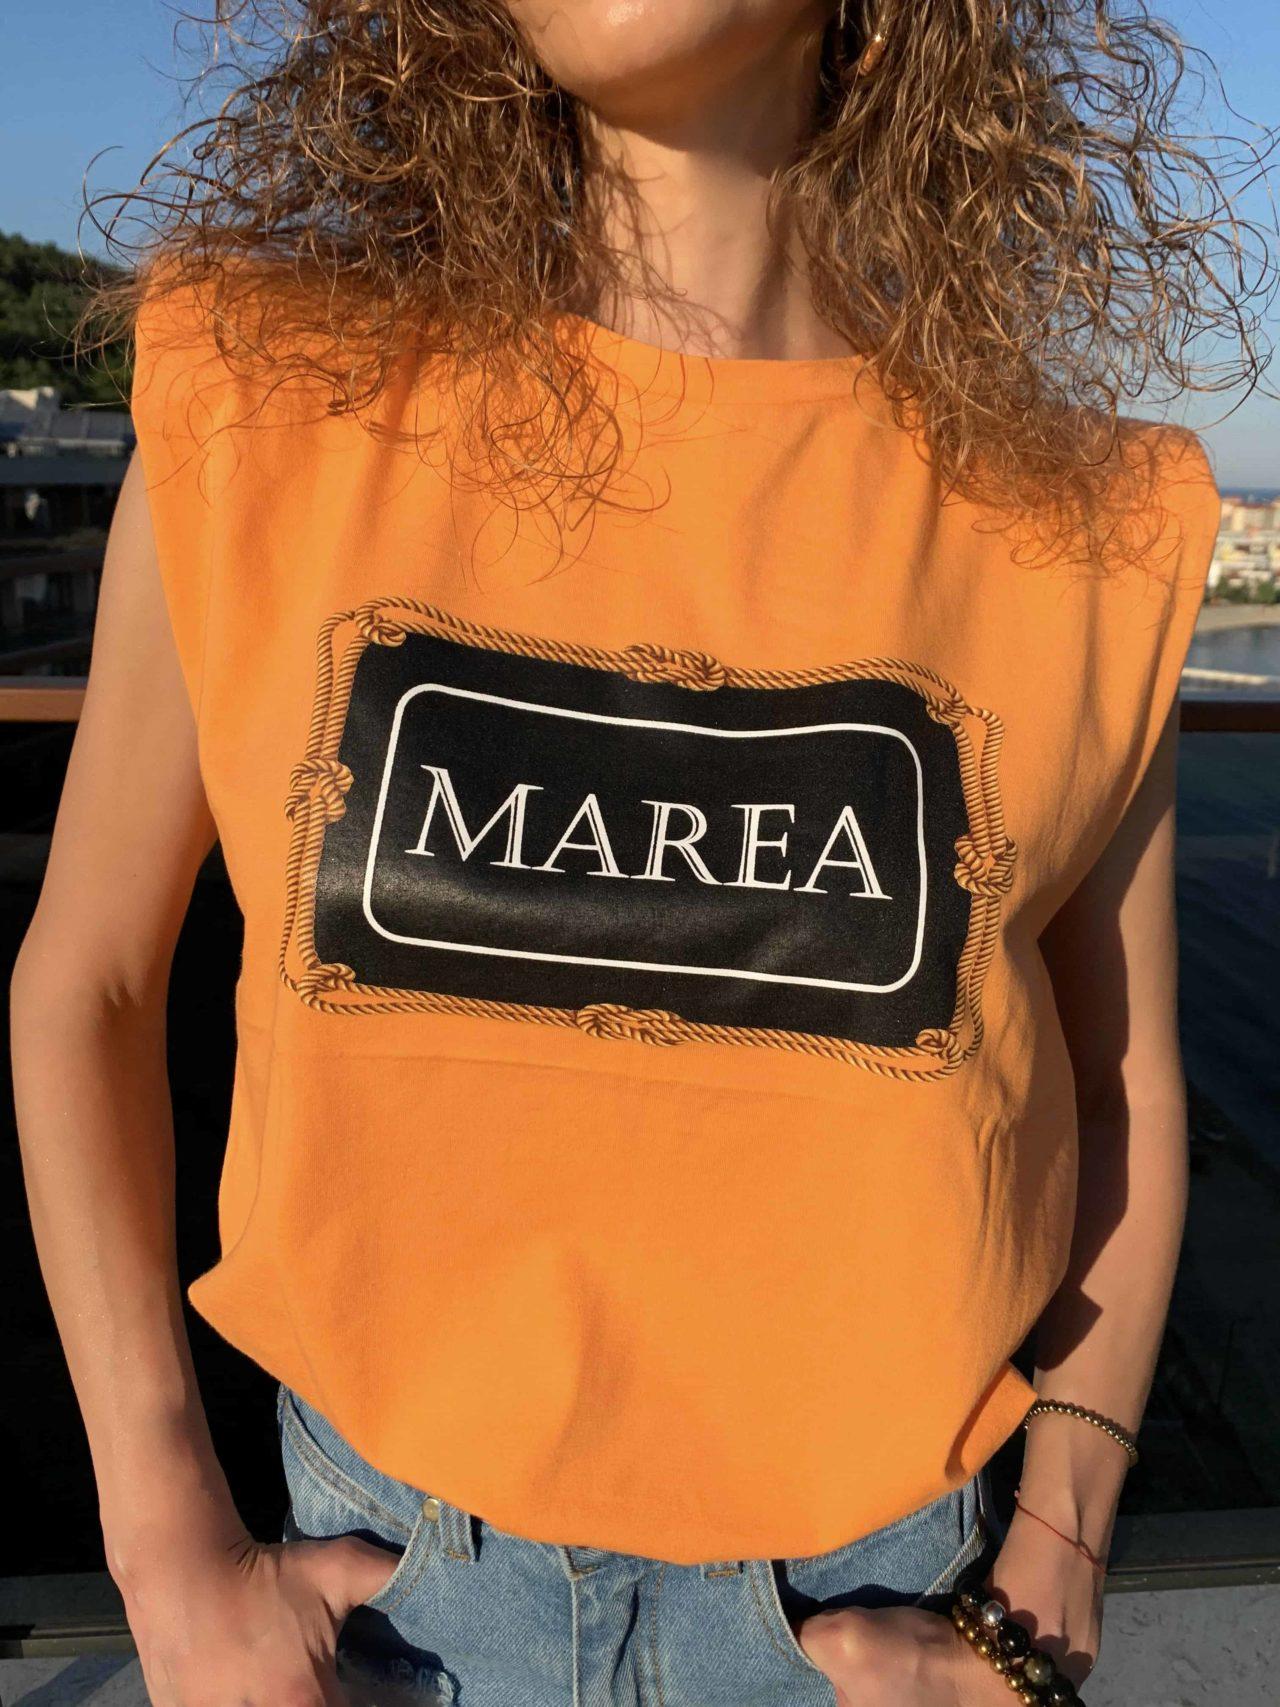 teniska-marea-orange-1